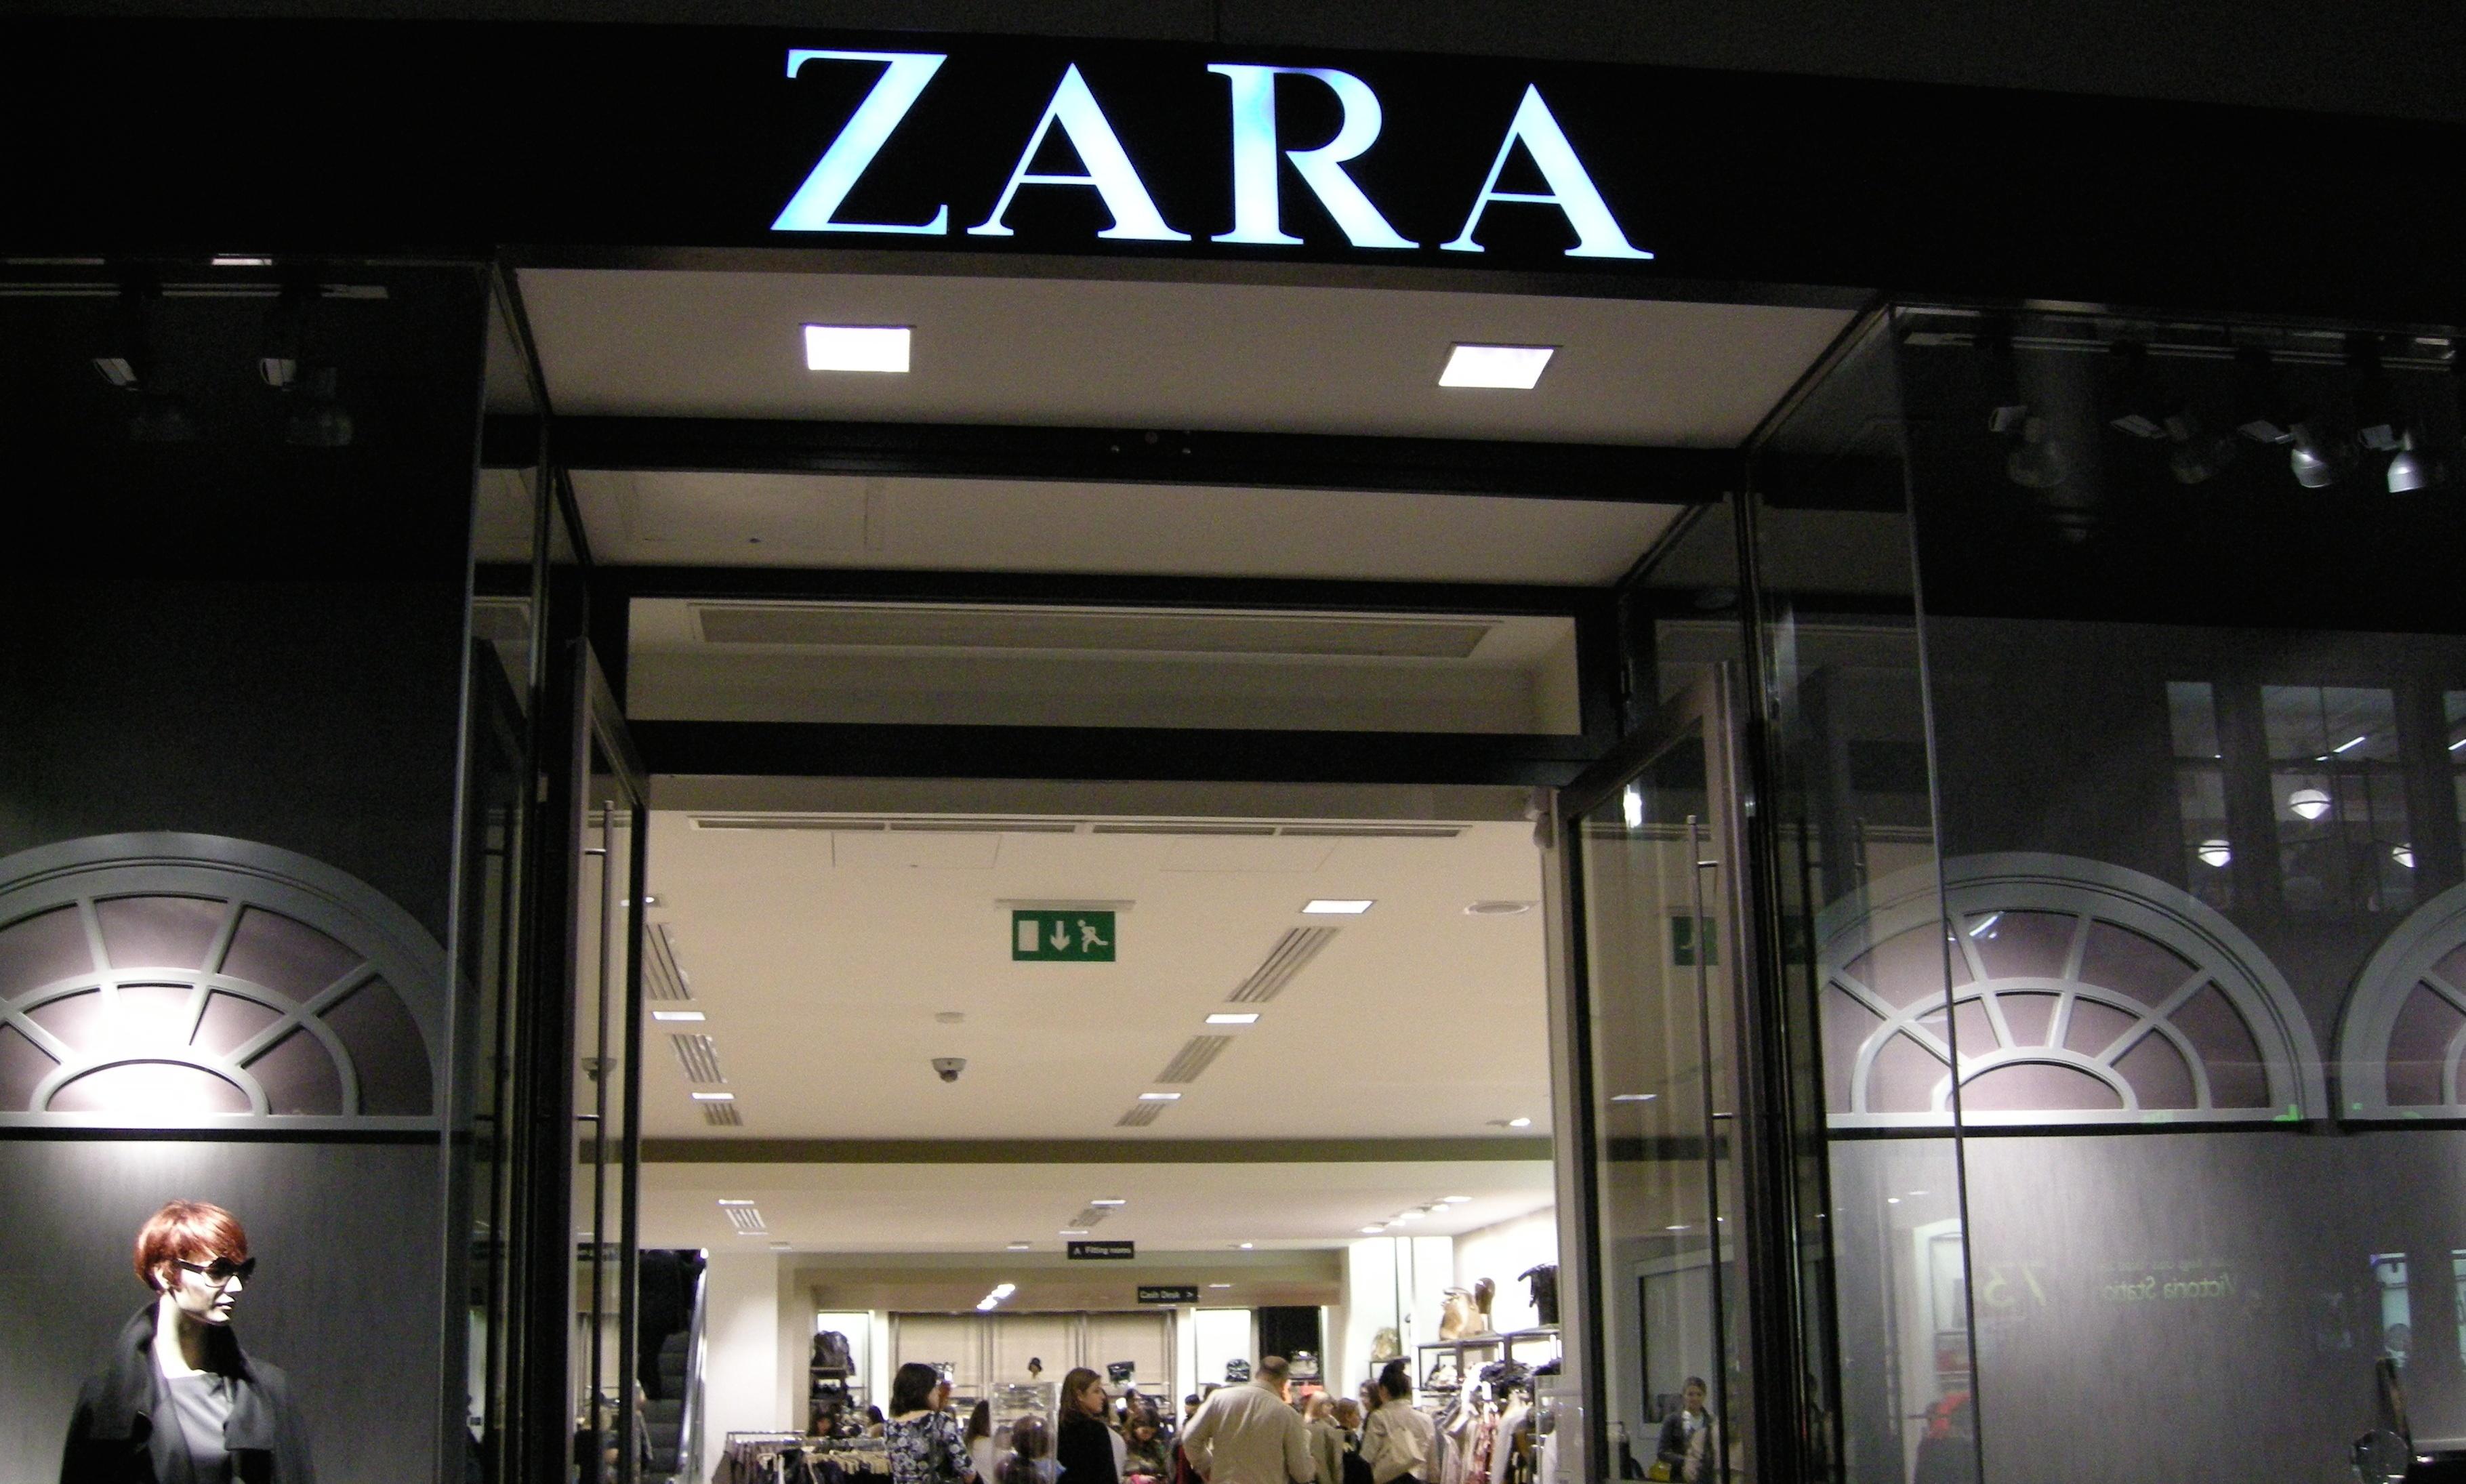 How Zara Controls Stock With RFID